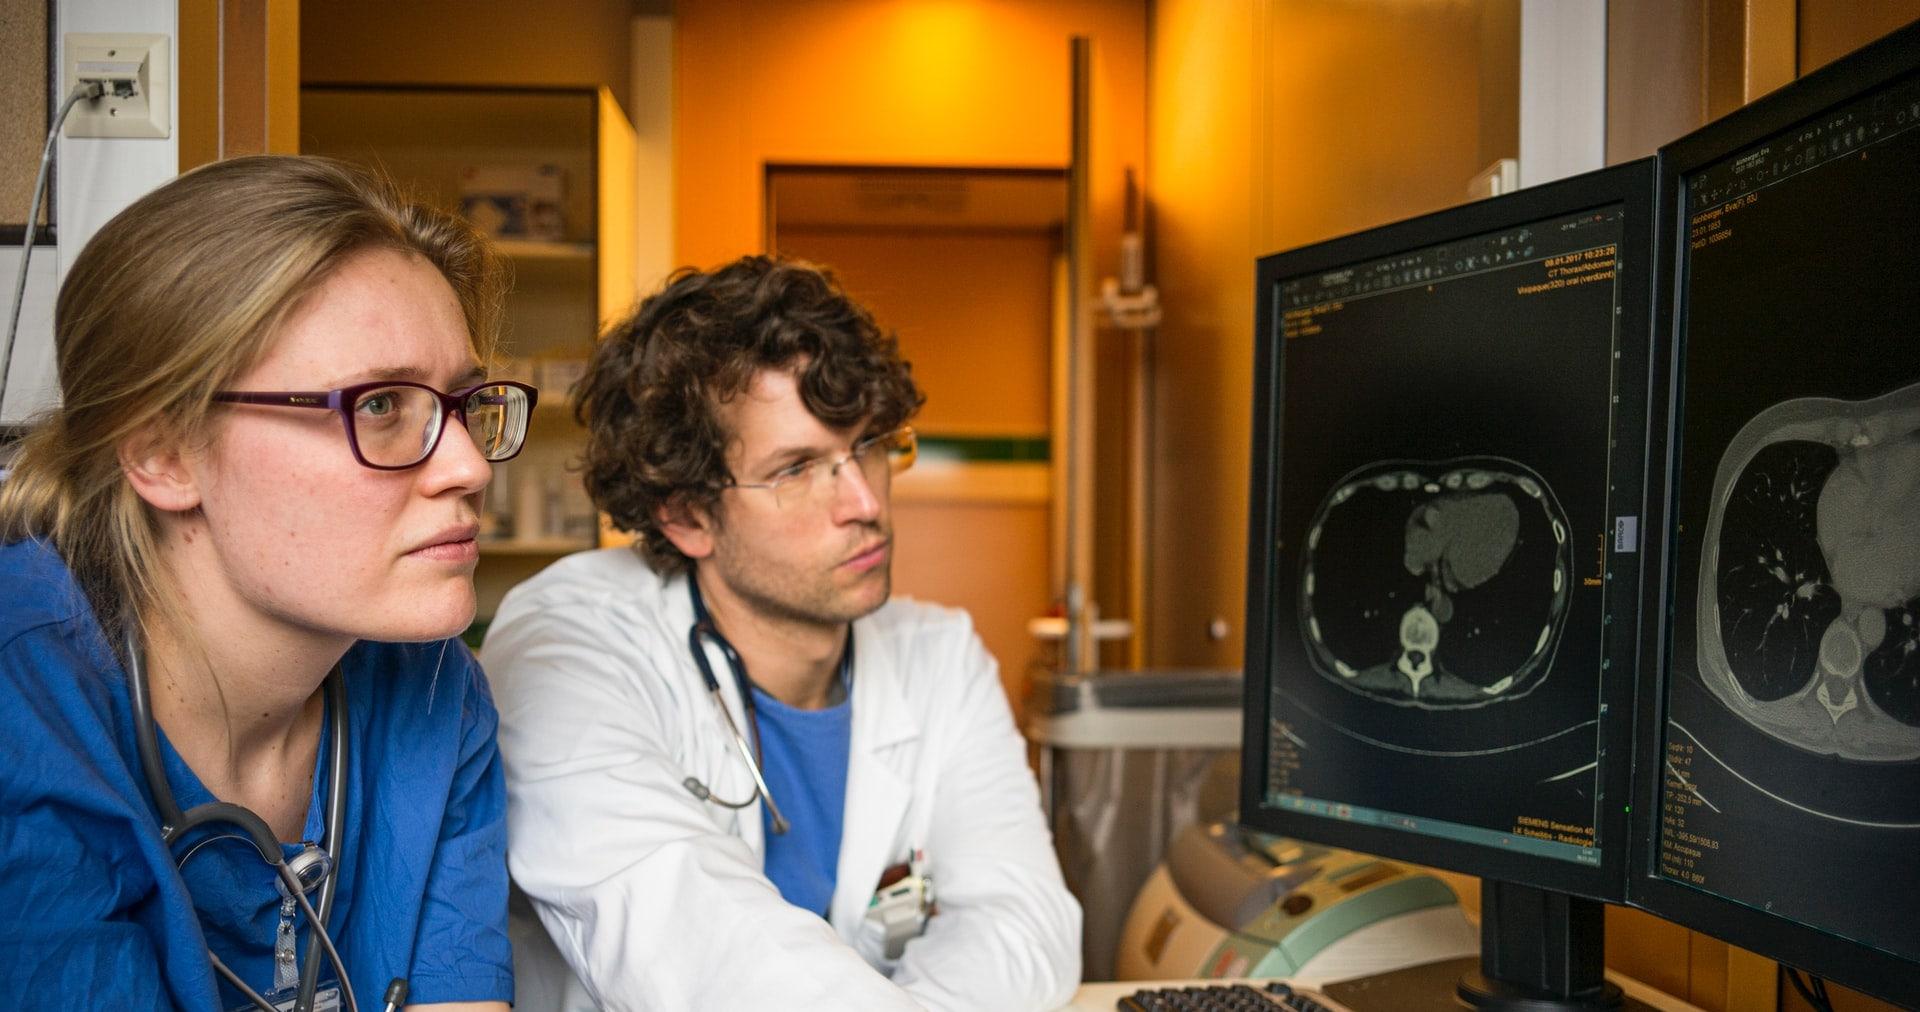 ML algorithms in radiology